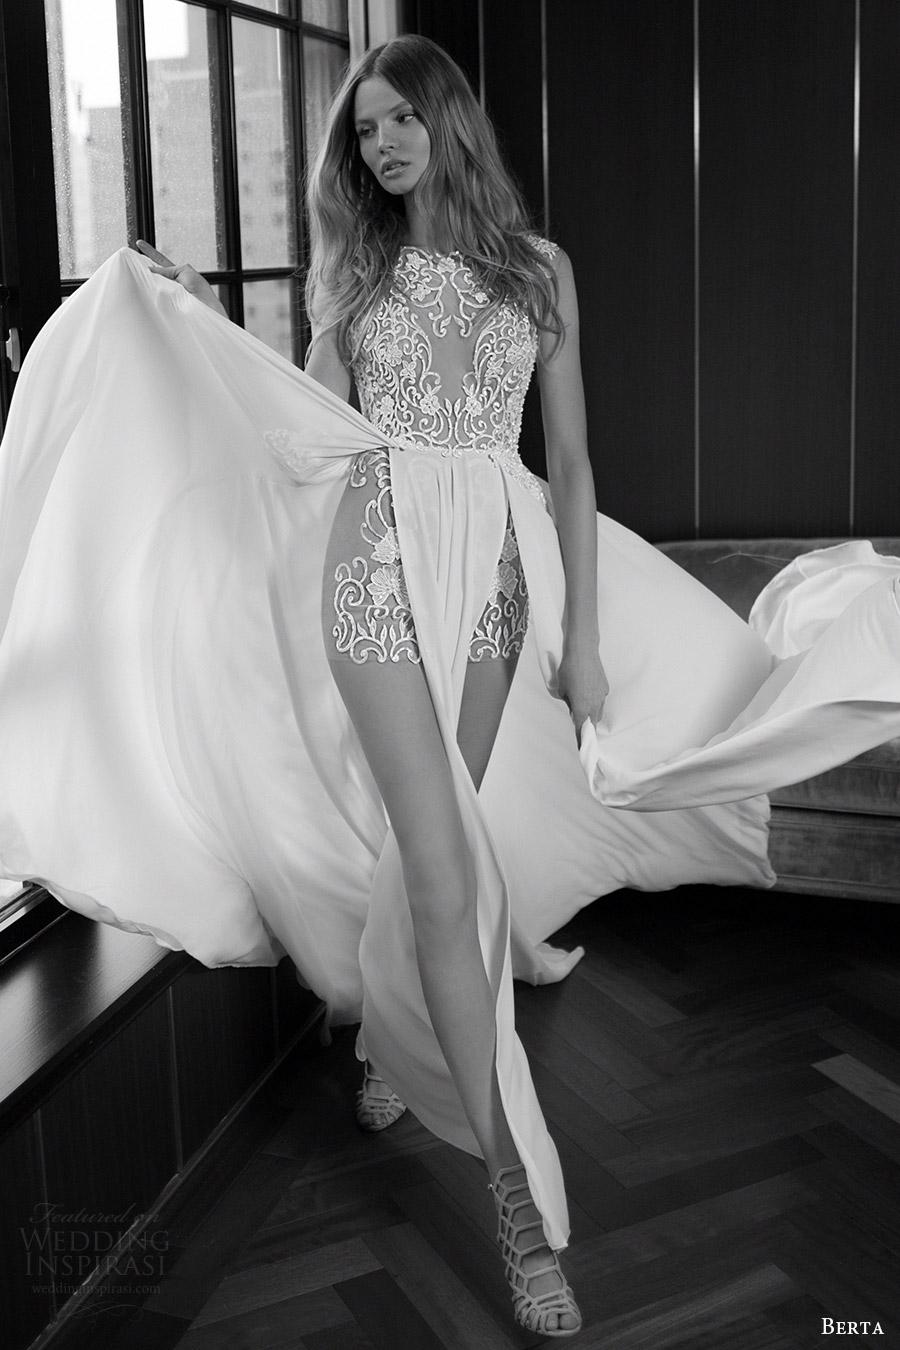 berta bridal fall 2016 sleeveless illusion jewel neck wedding dress aline double slit overskirt (16 106) mv